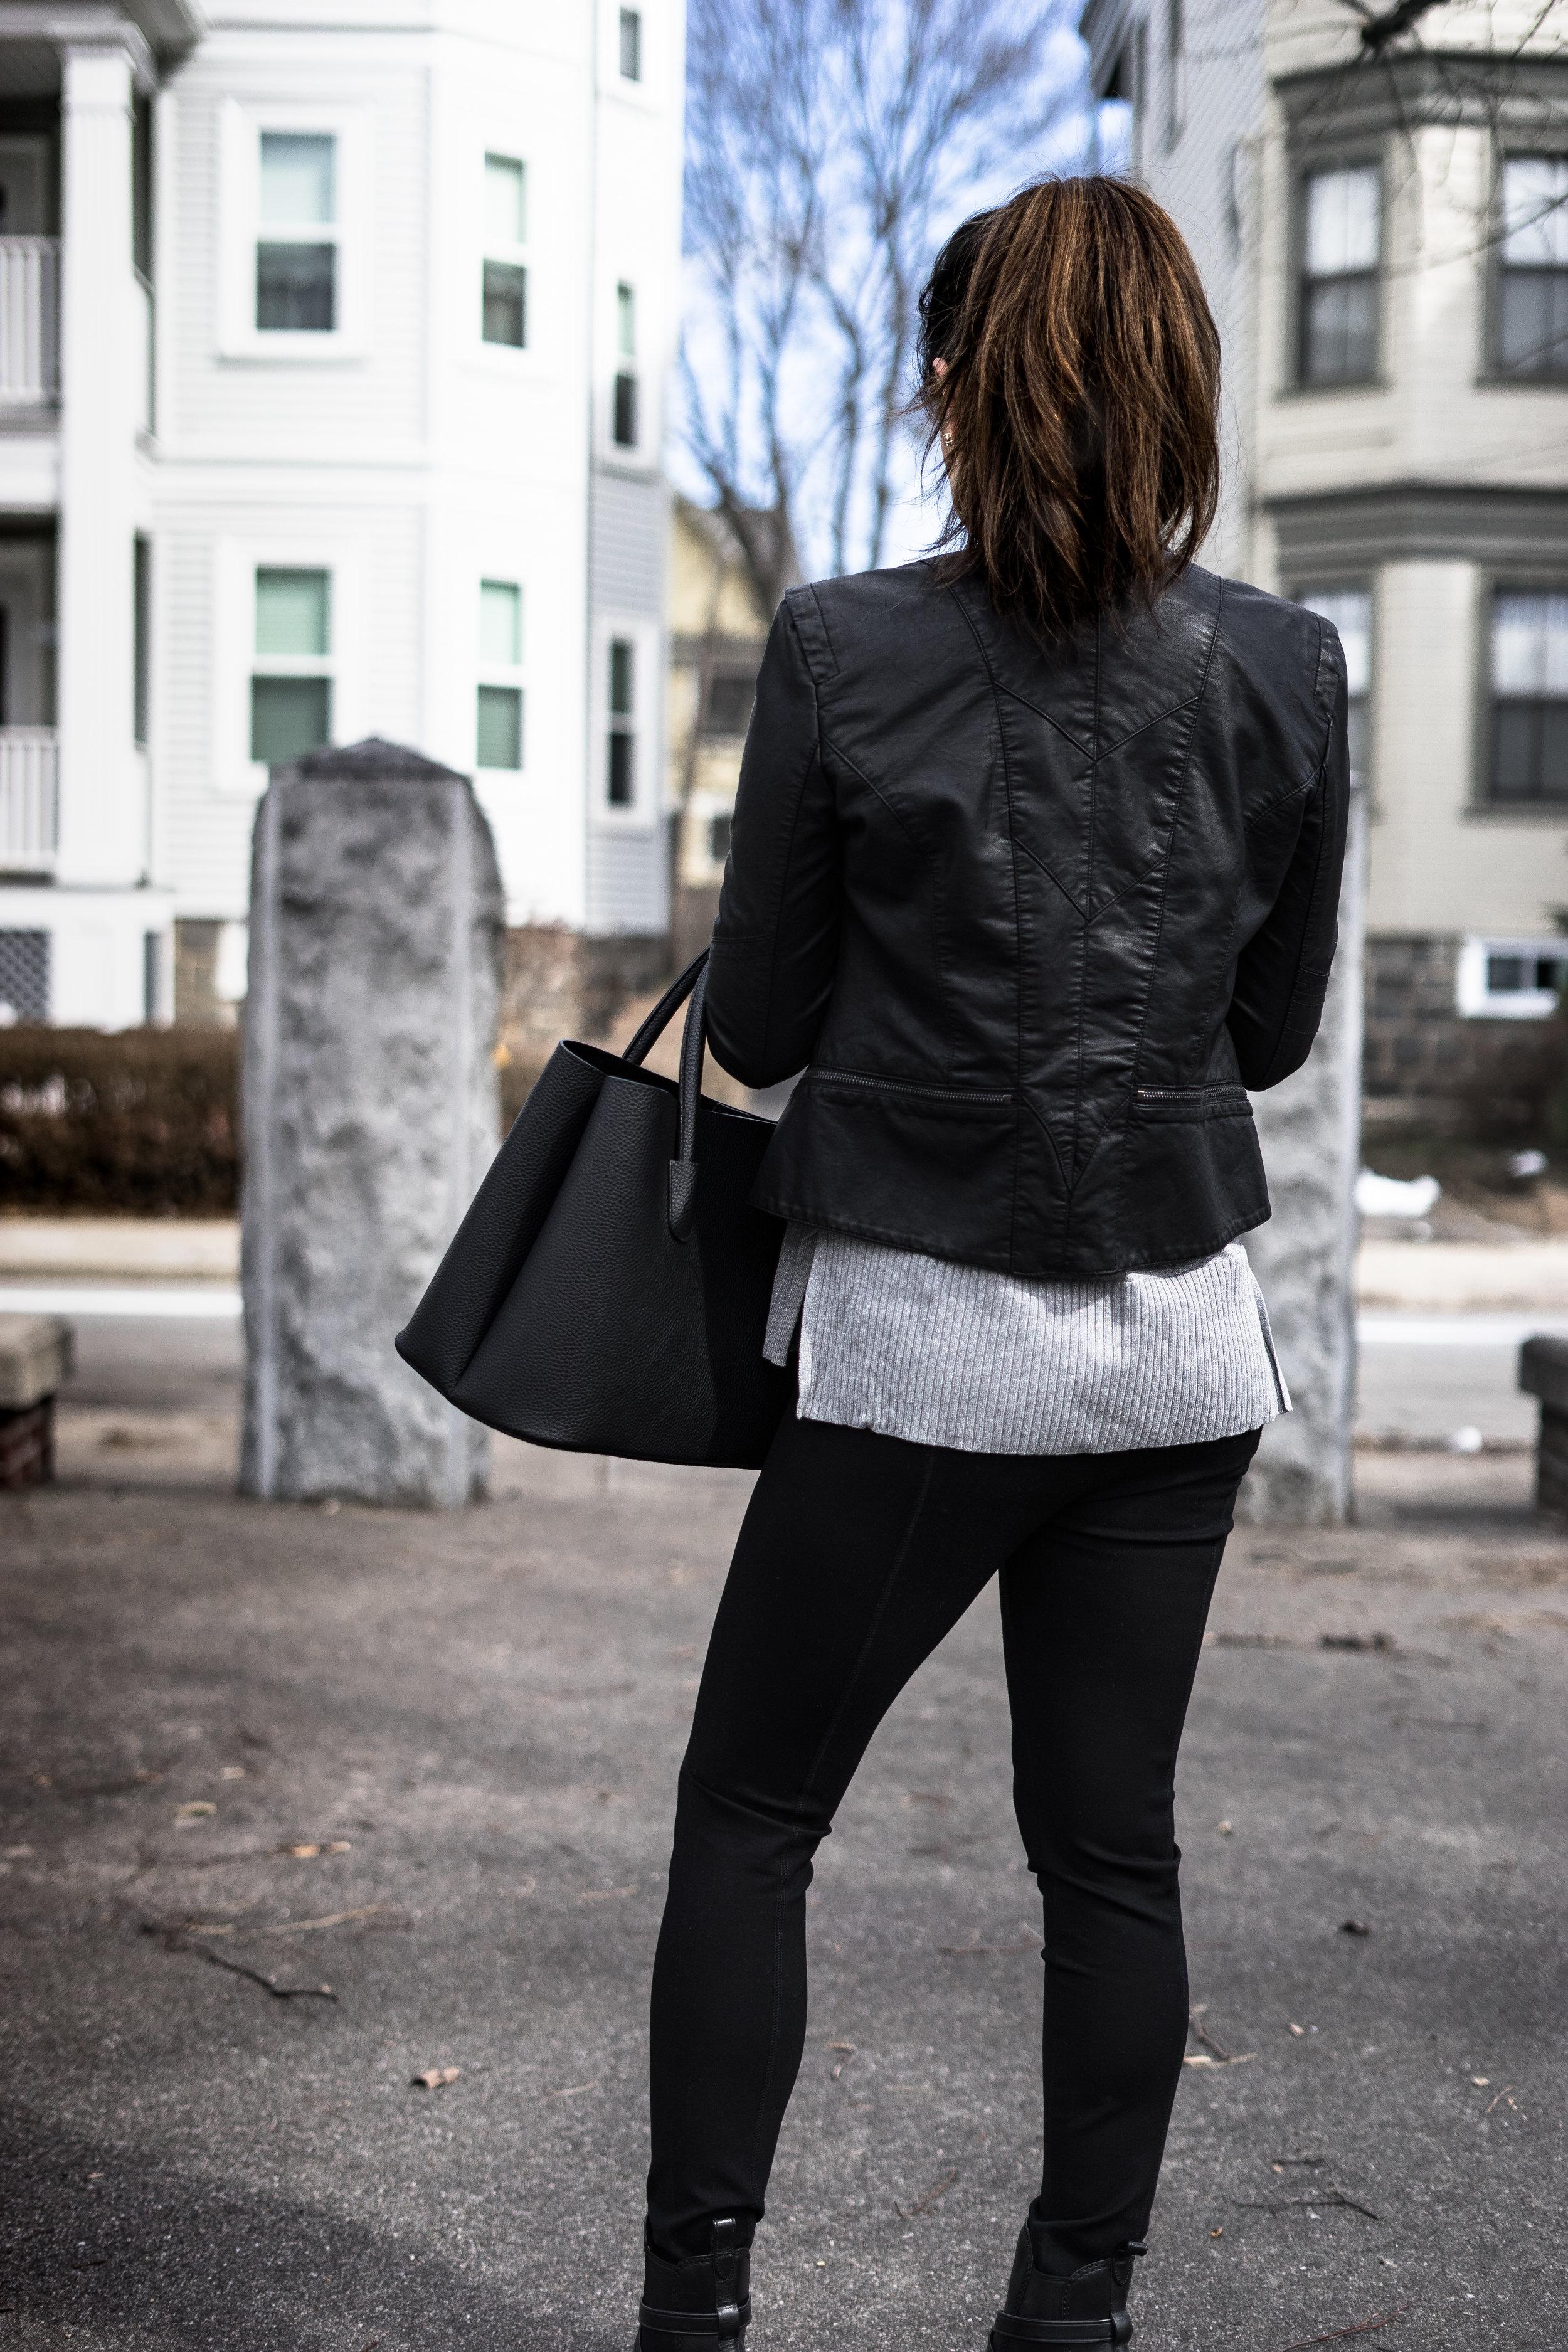 Moto Jacket for Transitional Weather: TheNinesBlog.com - A Boston Blog